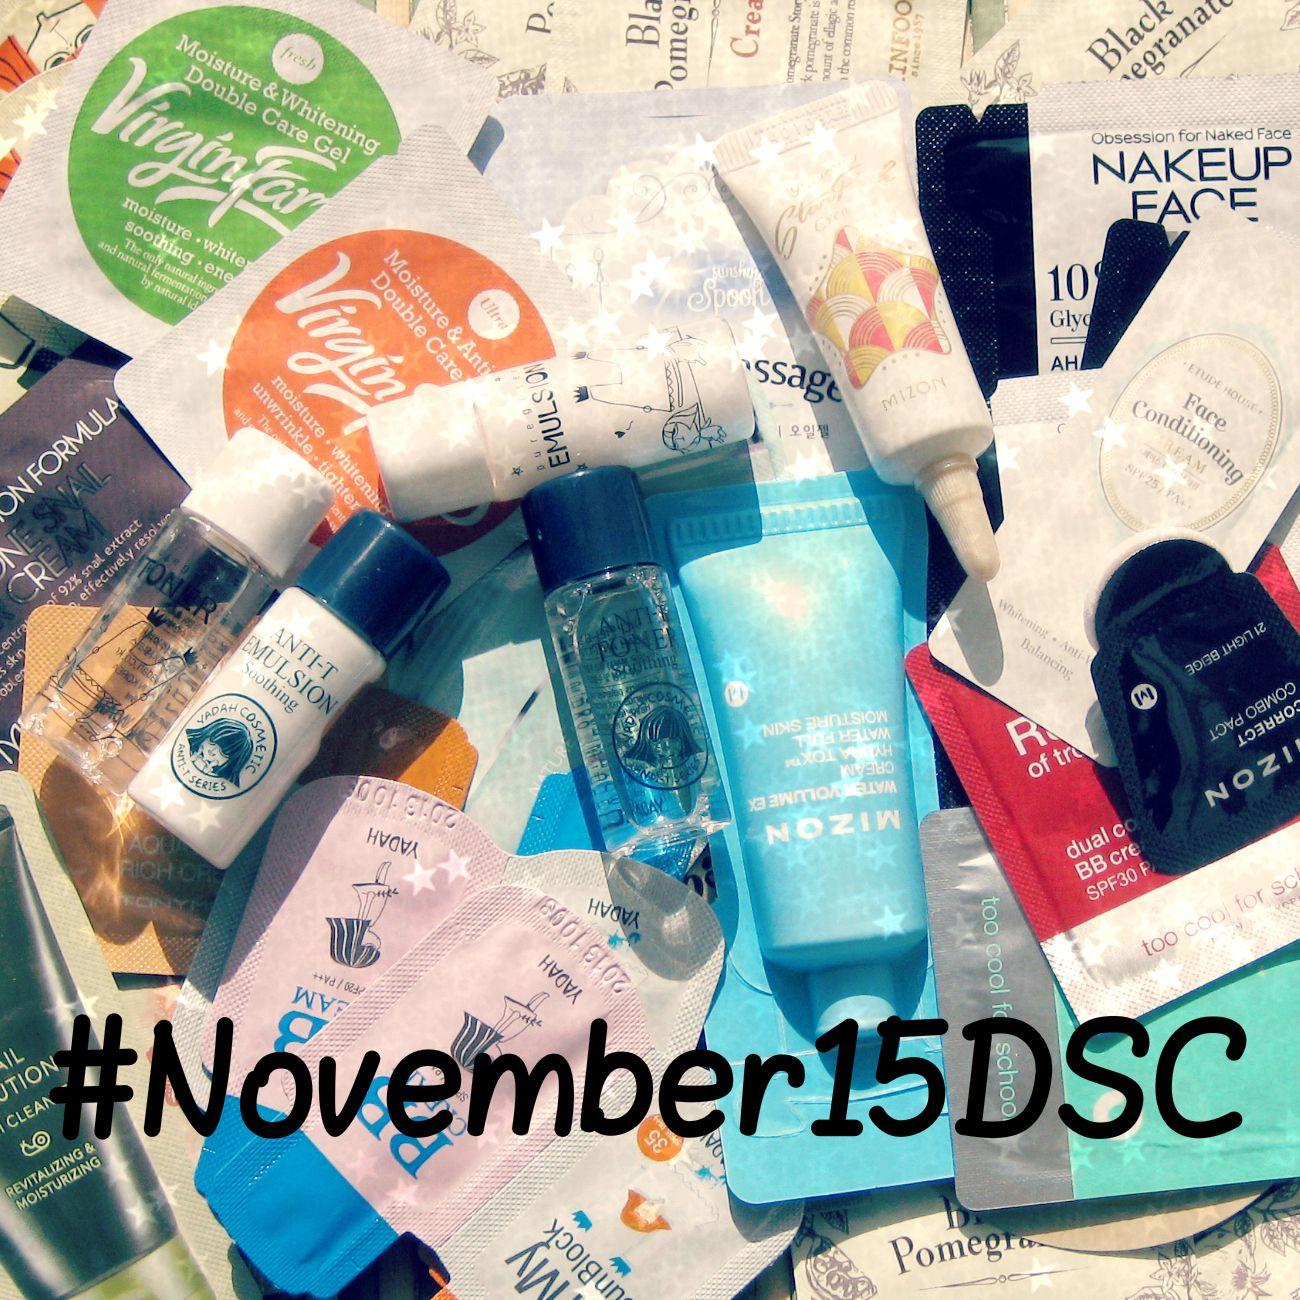 CamomilleBeautyTime: Ноябрьский марафон пробников #November15DSC с Camo...